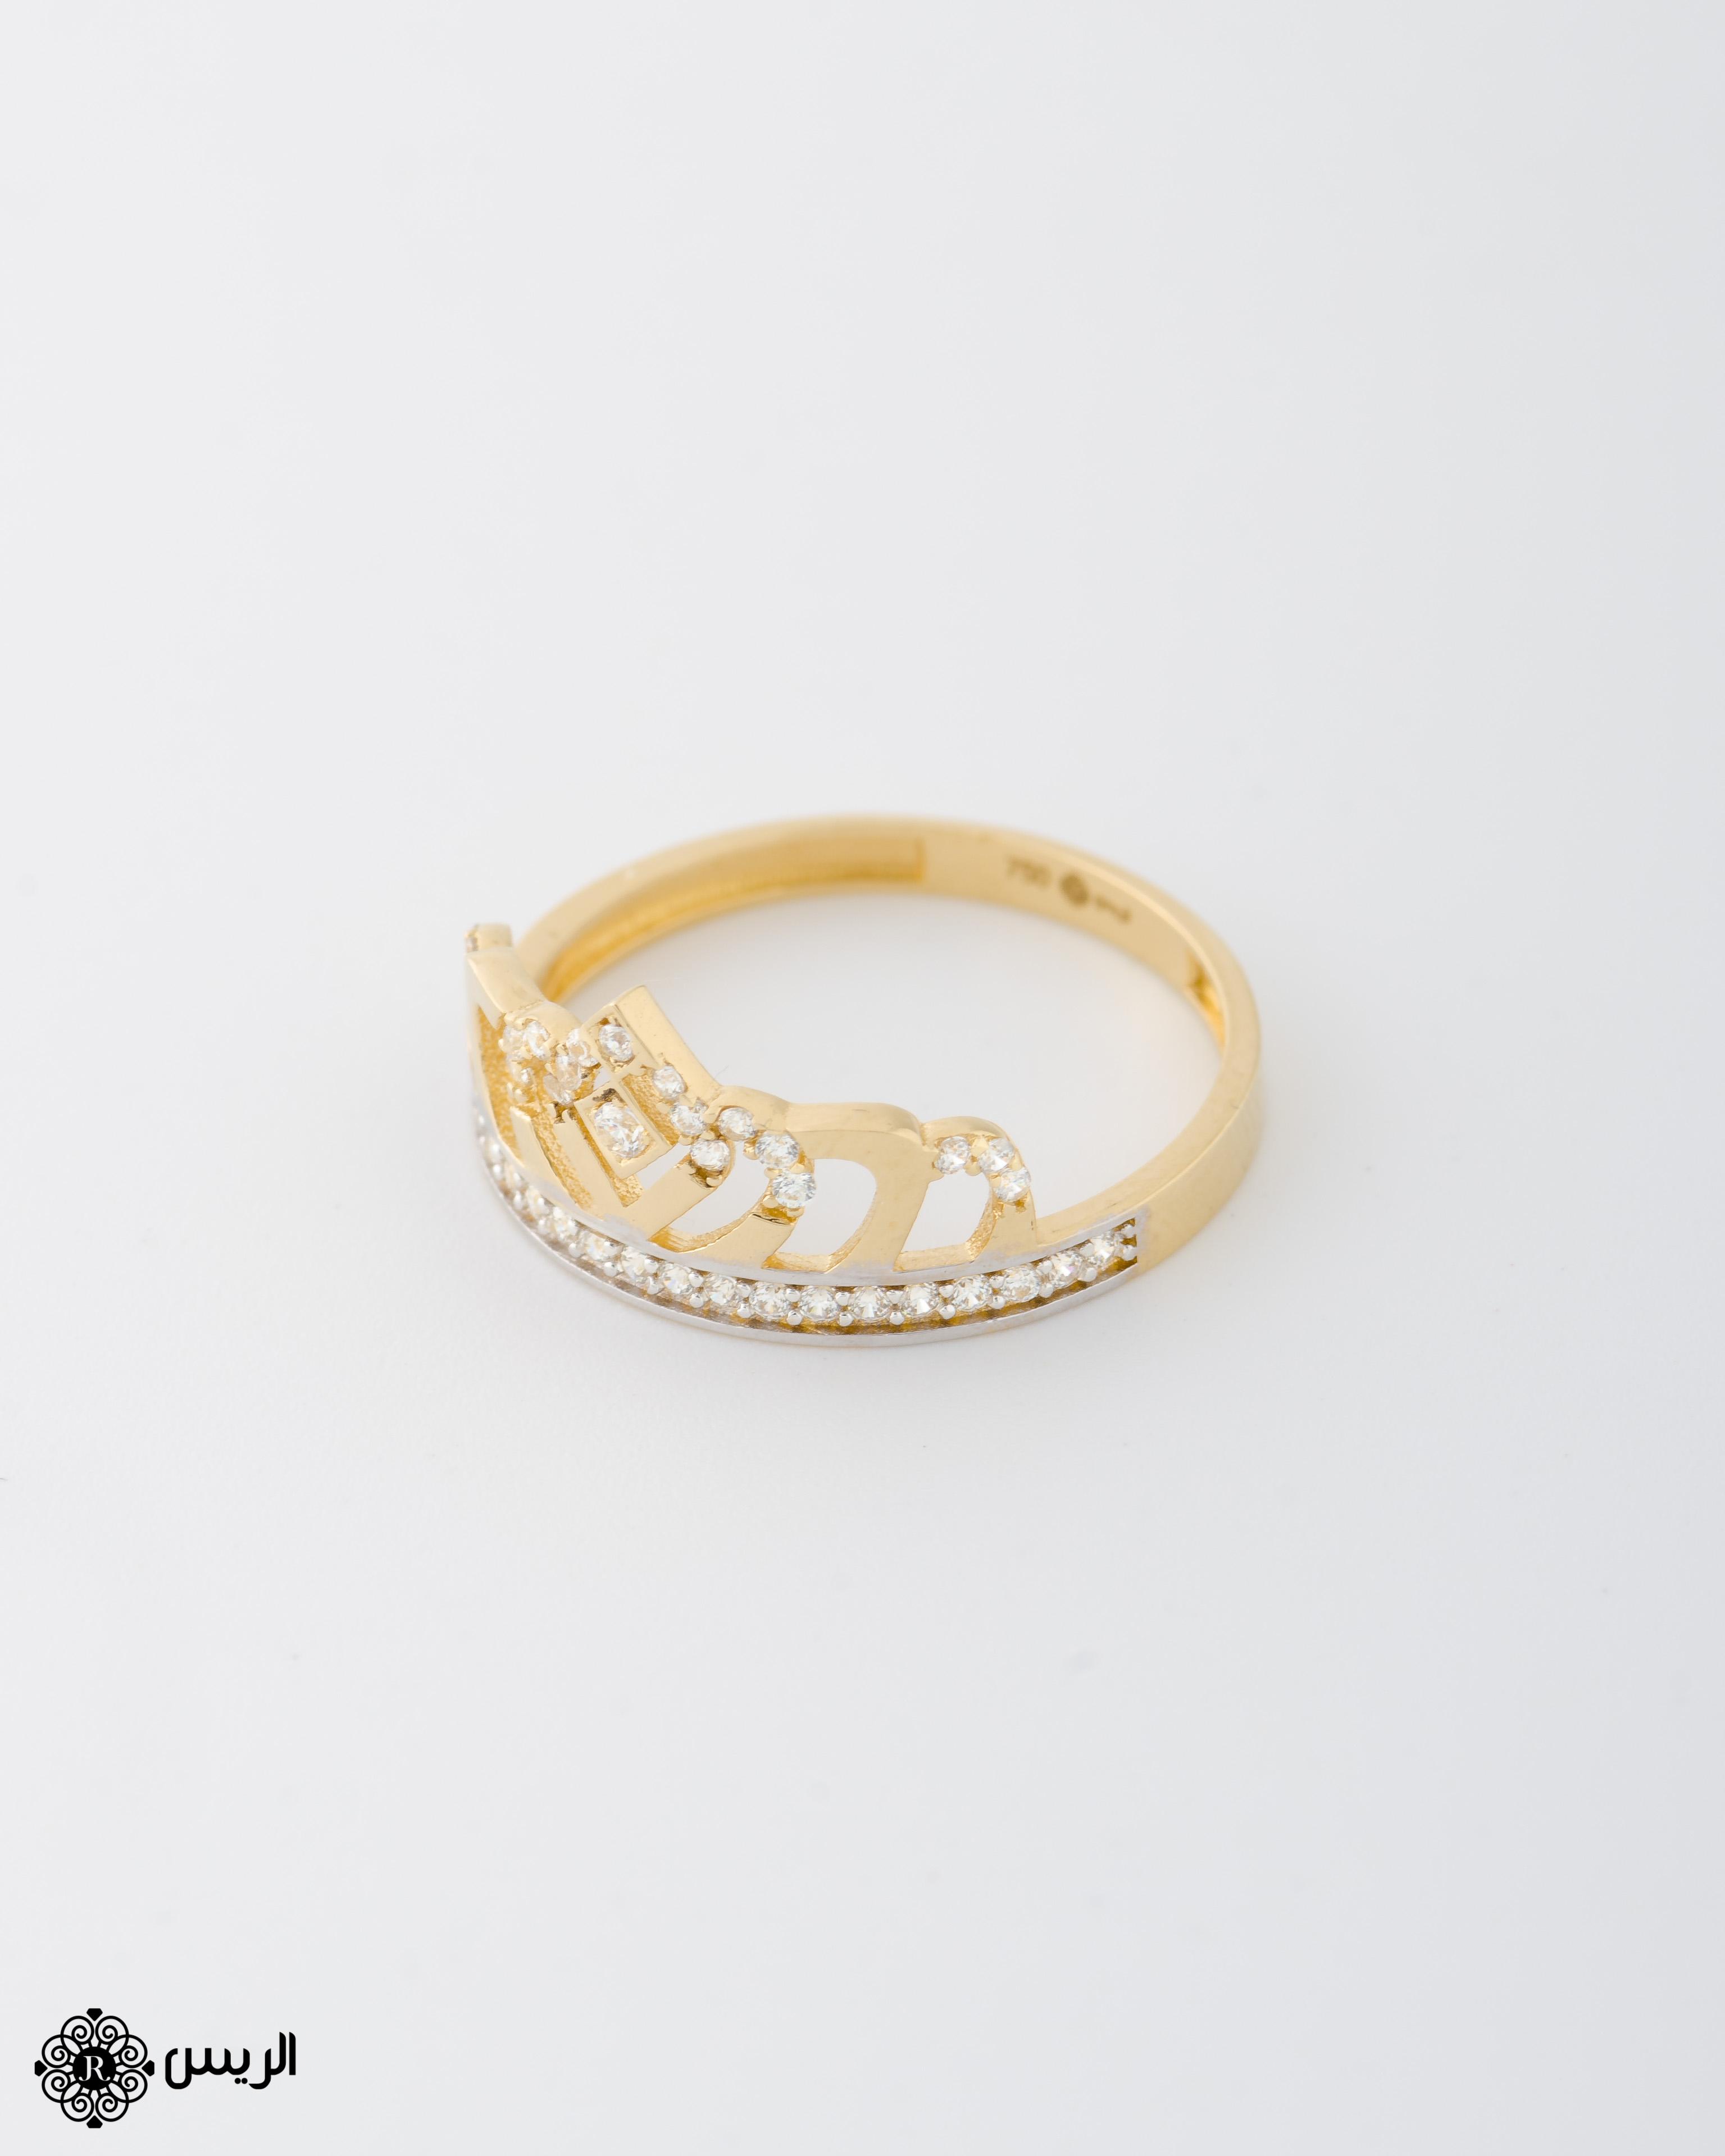 Raies jewelry Delicate Crown Ring خاتم تاج ناعم الريس للمجوهرات